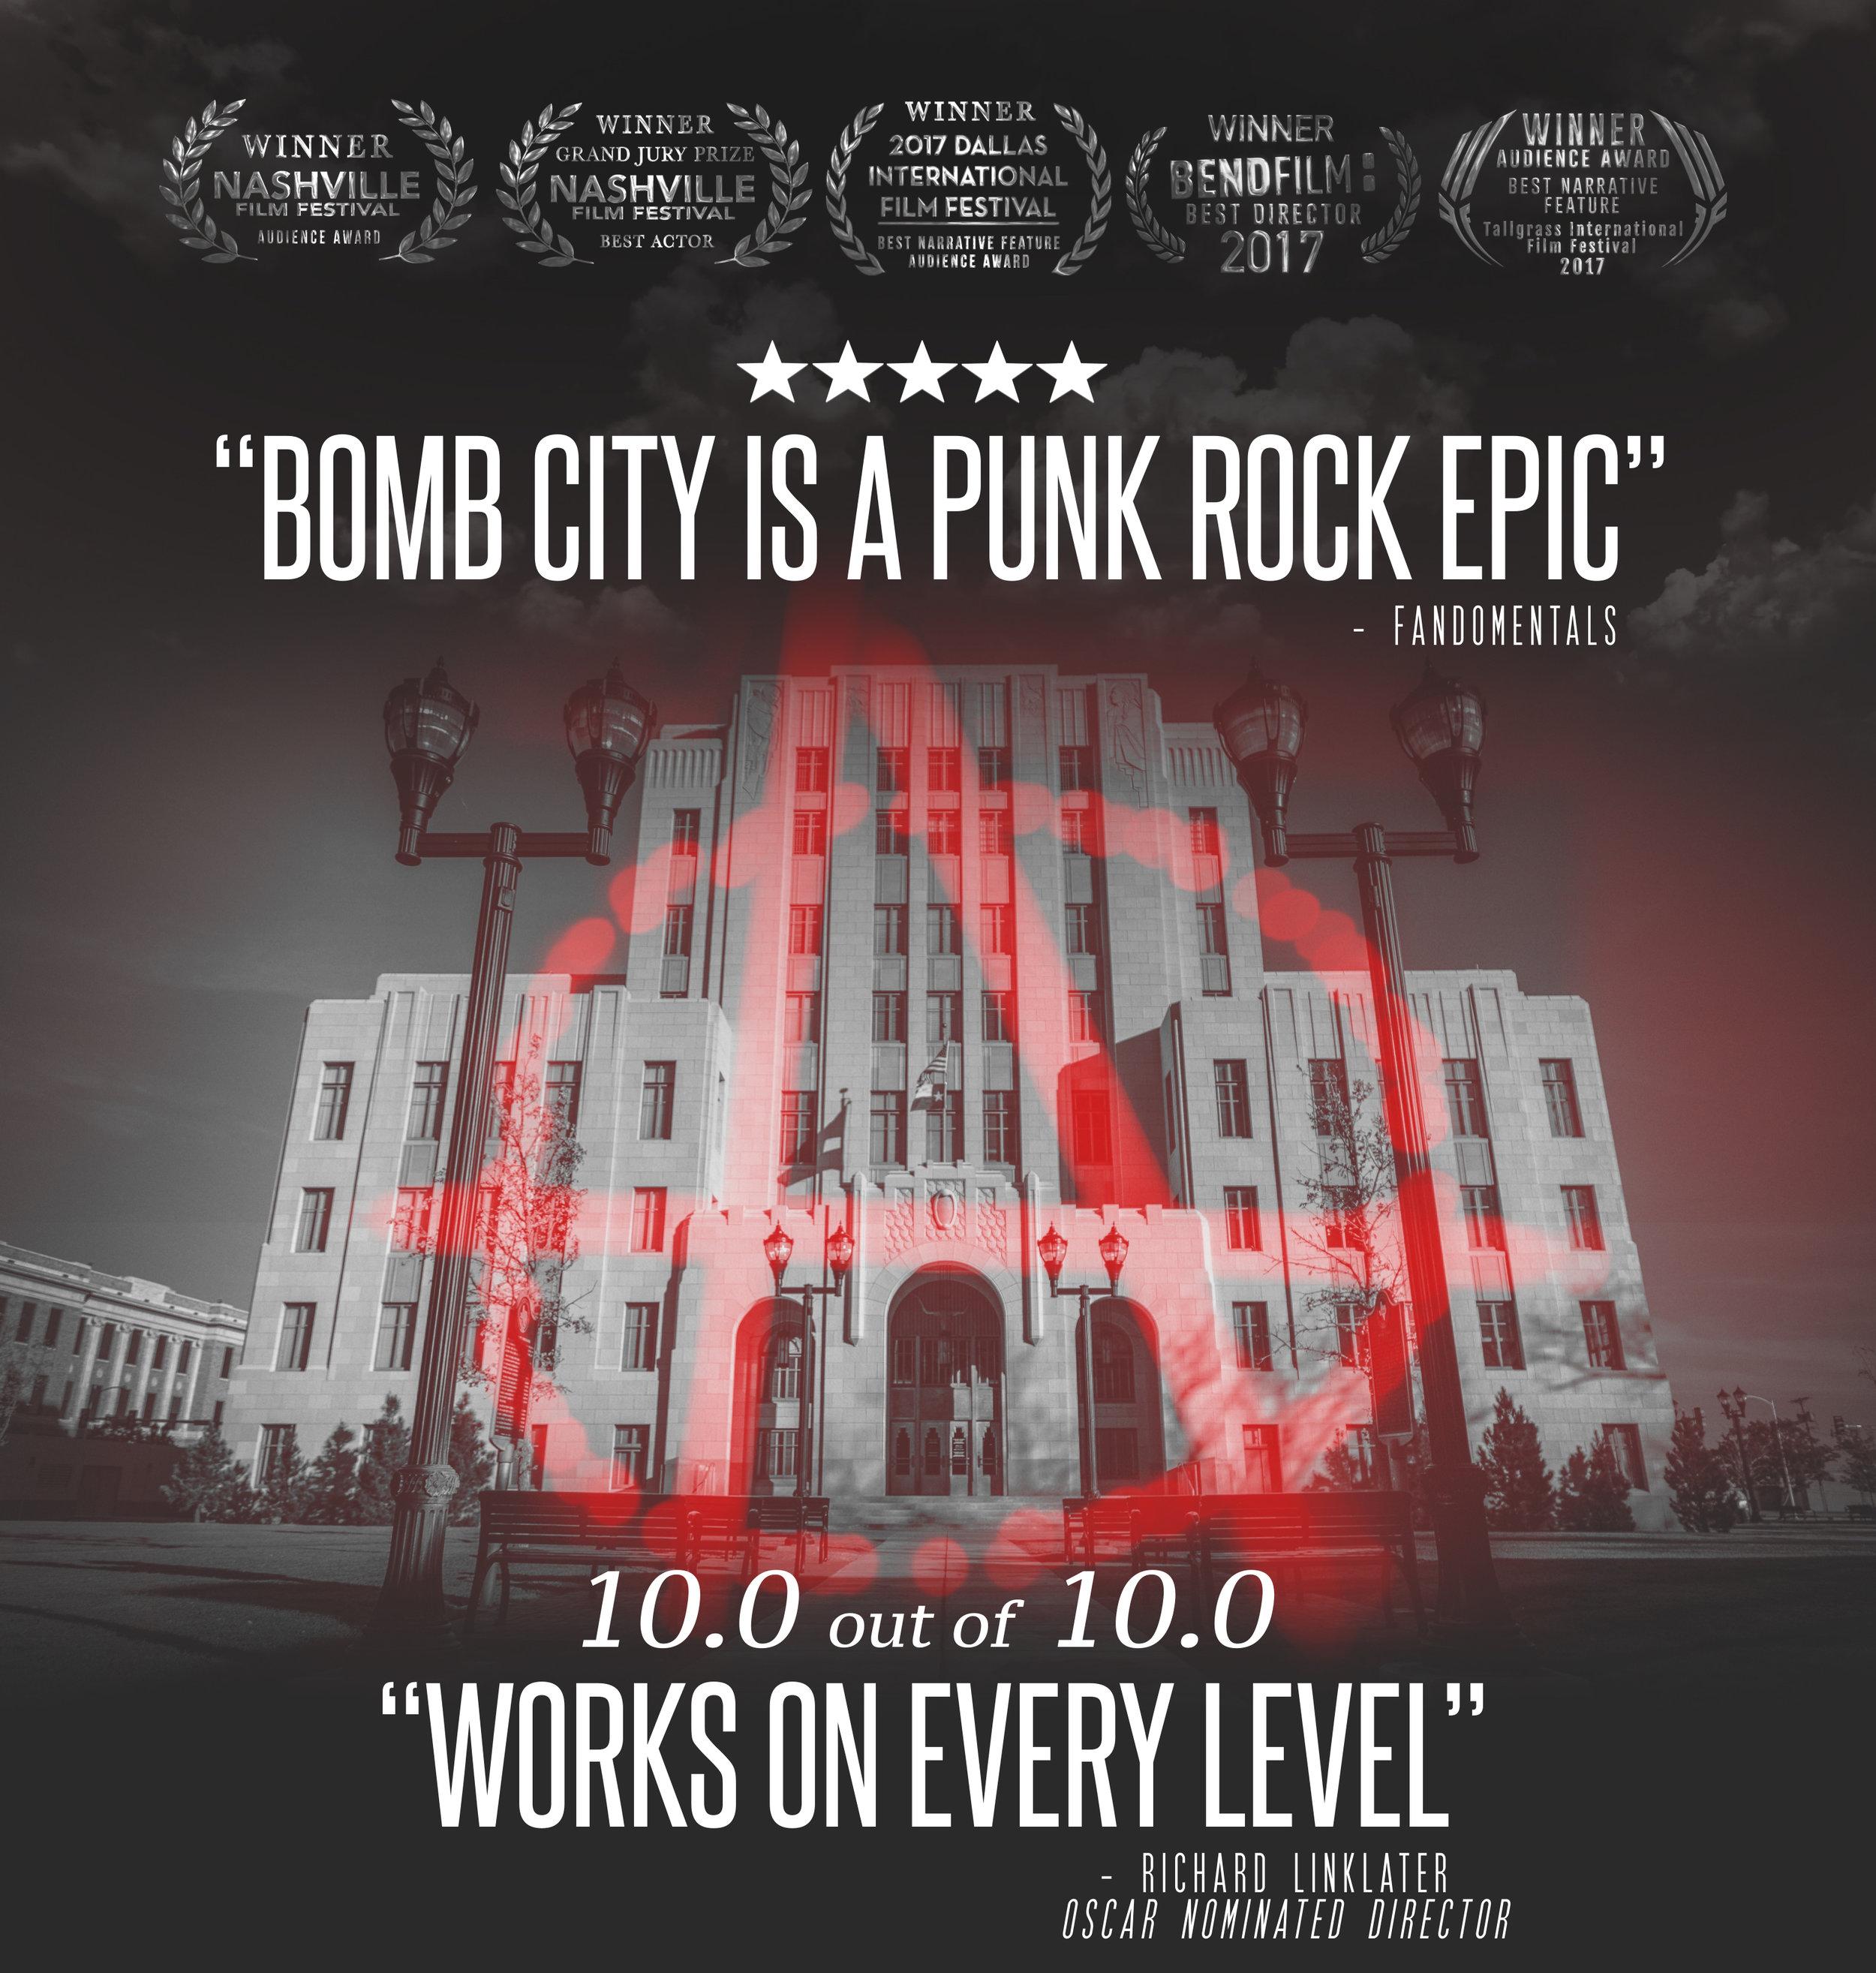 bomb-city-film-movie-brian-deneke-reviews-jameson-brooks-sheldon-chick-cody-chick-3rdidentity-3rd identity-quotes-critics-Amarillo-Richard-Linklater-punk-rock-true-story-glenn-morshower-dave davis-jamie brooks.jpg